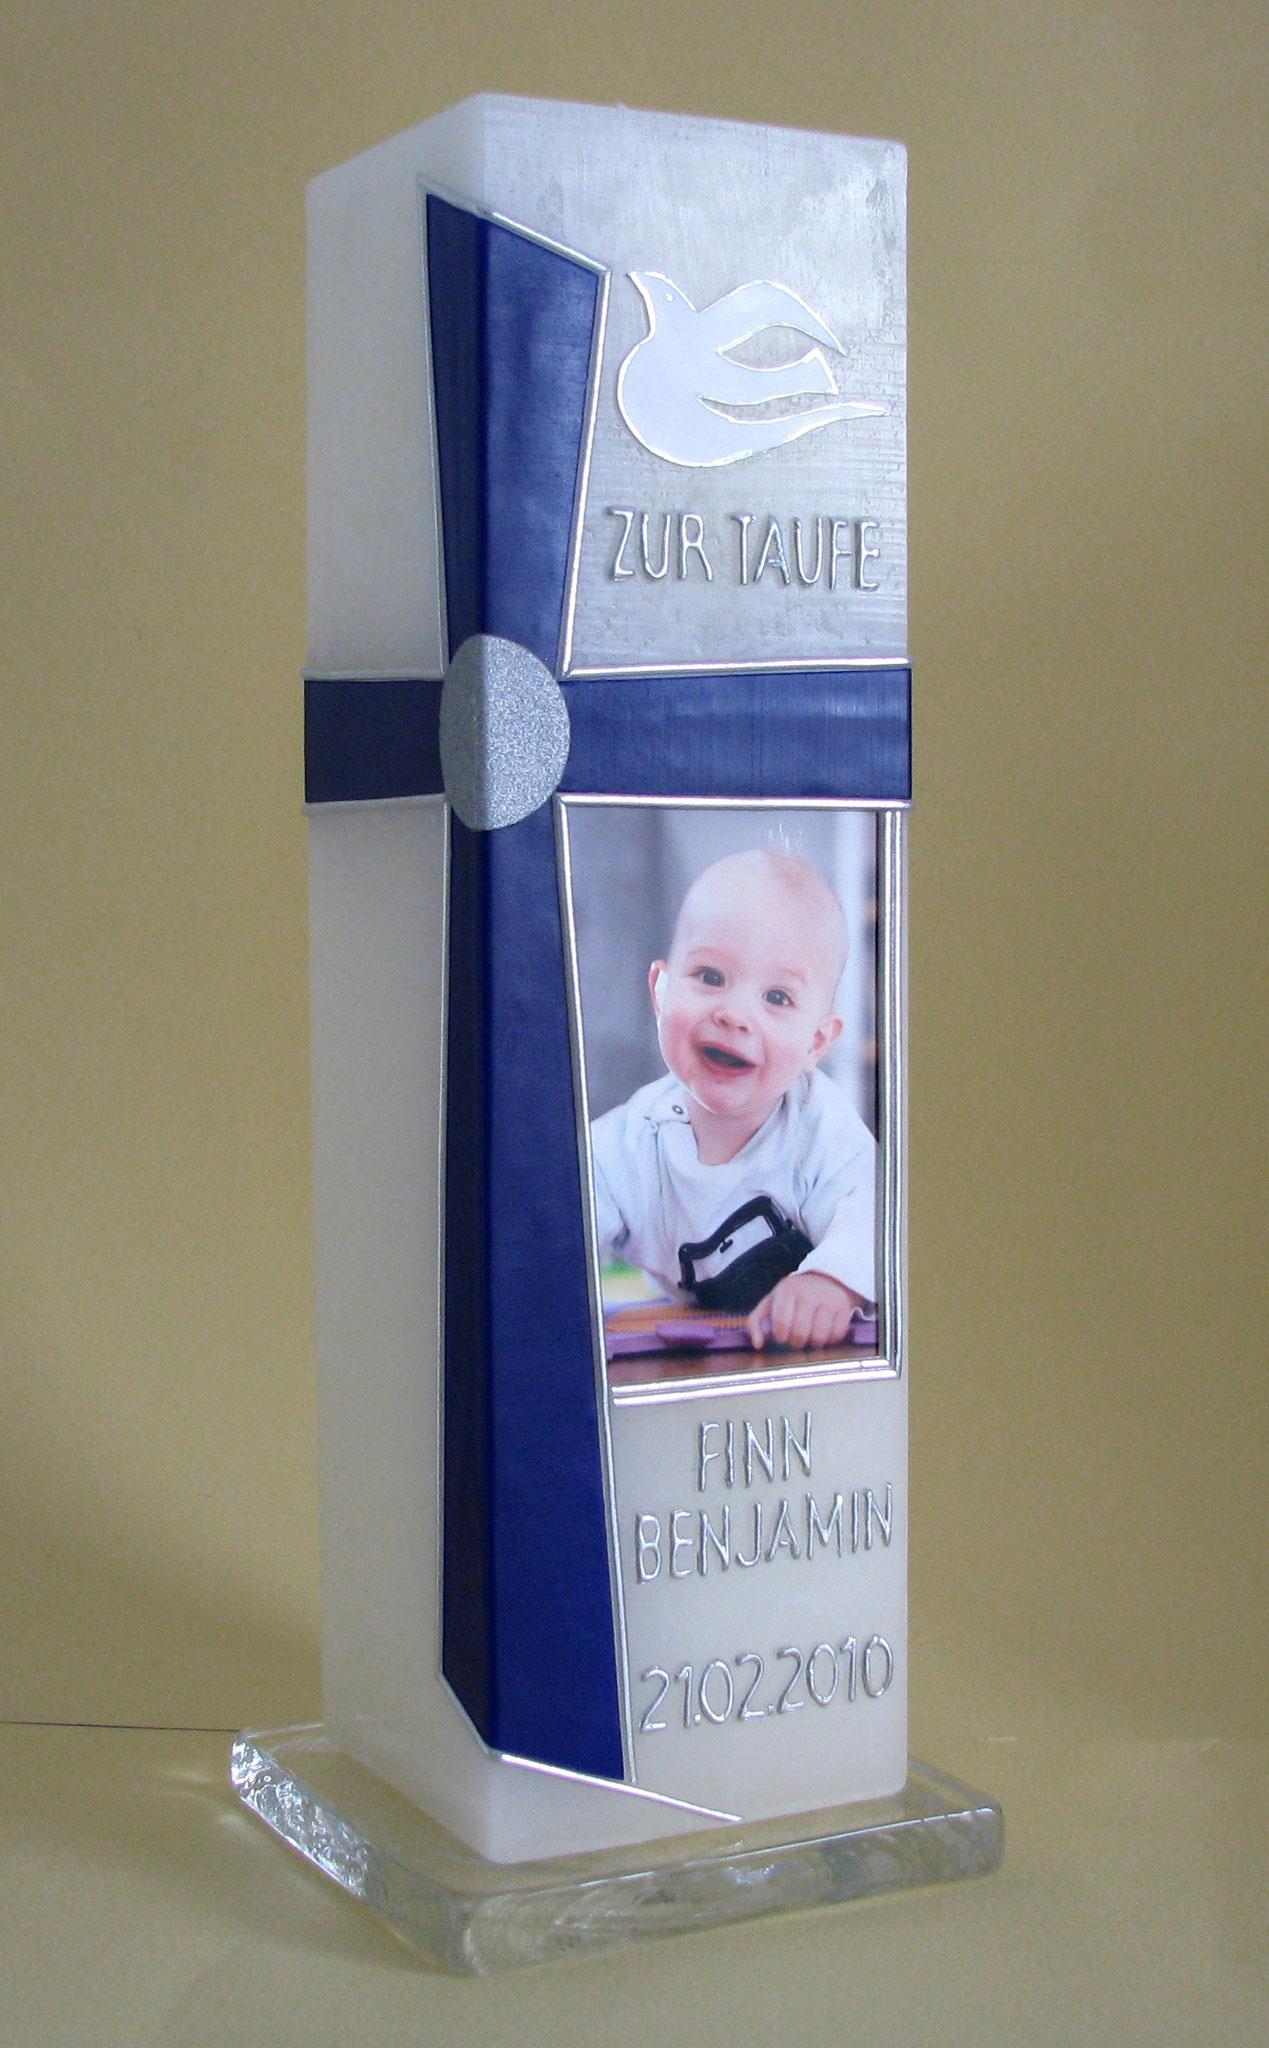 TE-3007, quadratisch, HxB ca. 25 cm x 7,5 cm, Preis ca. € 47,-- + Kosten für Foto